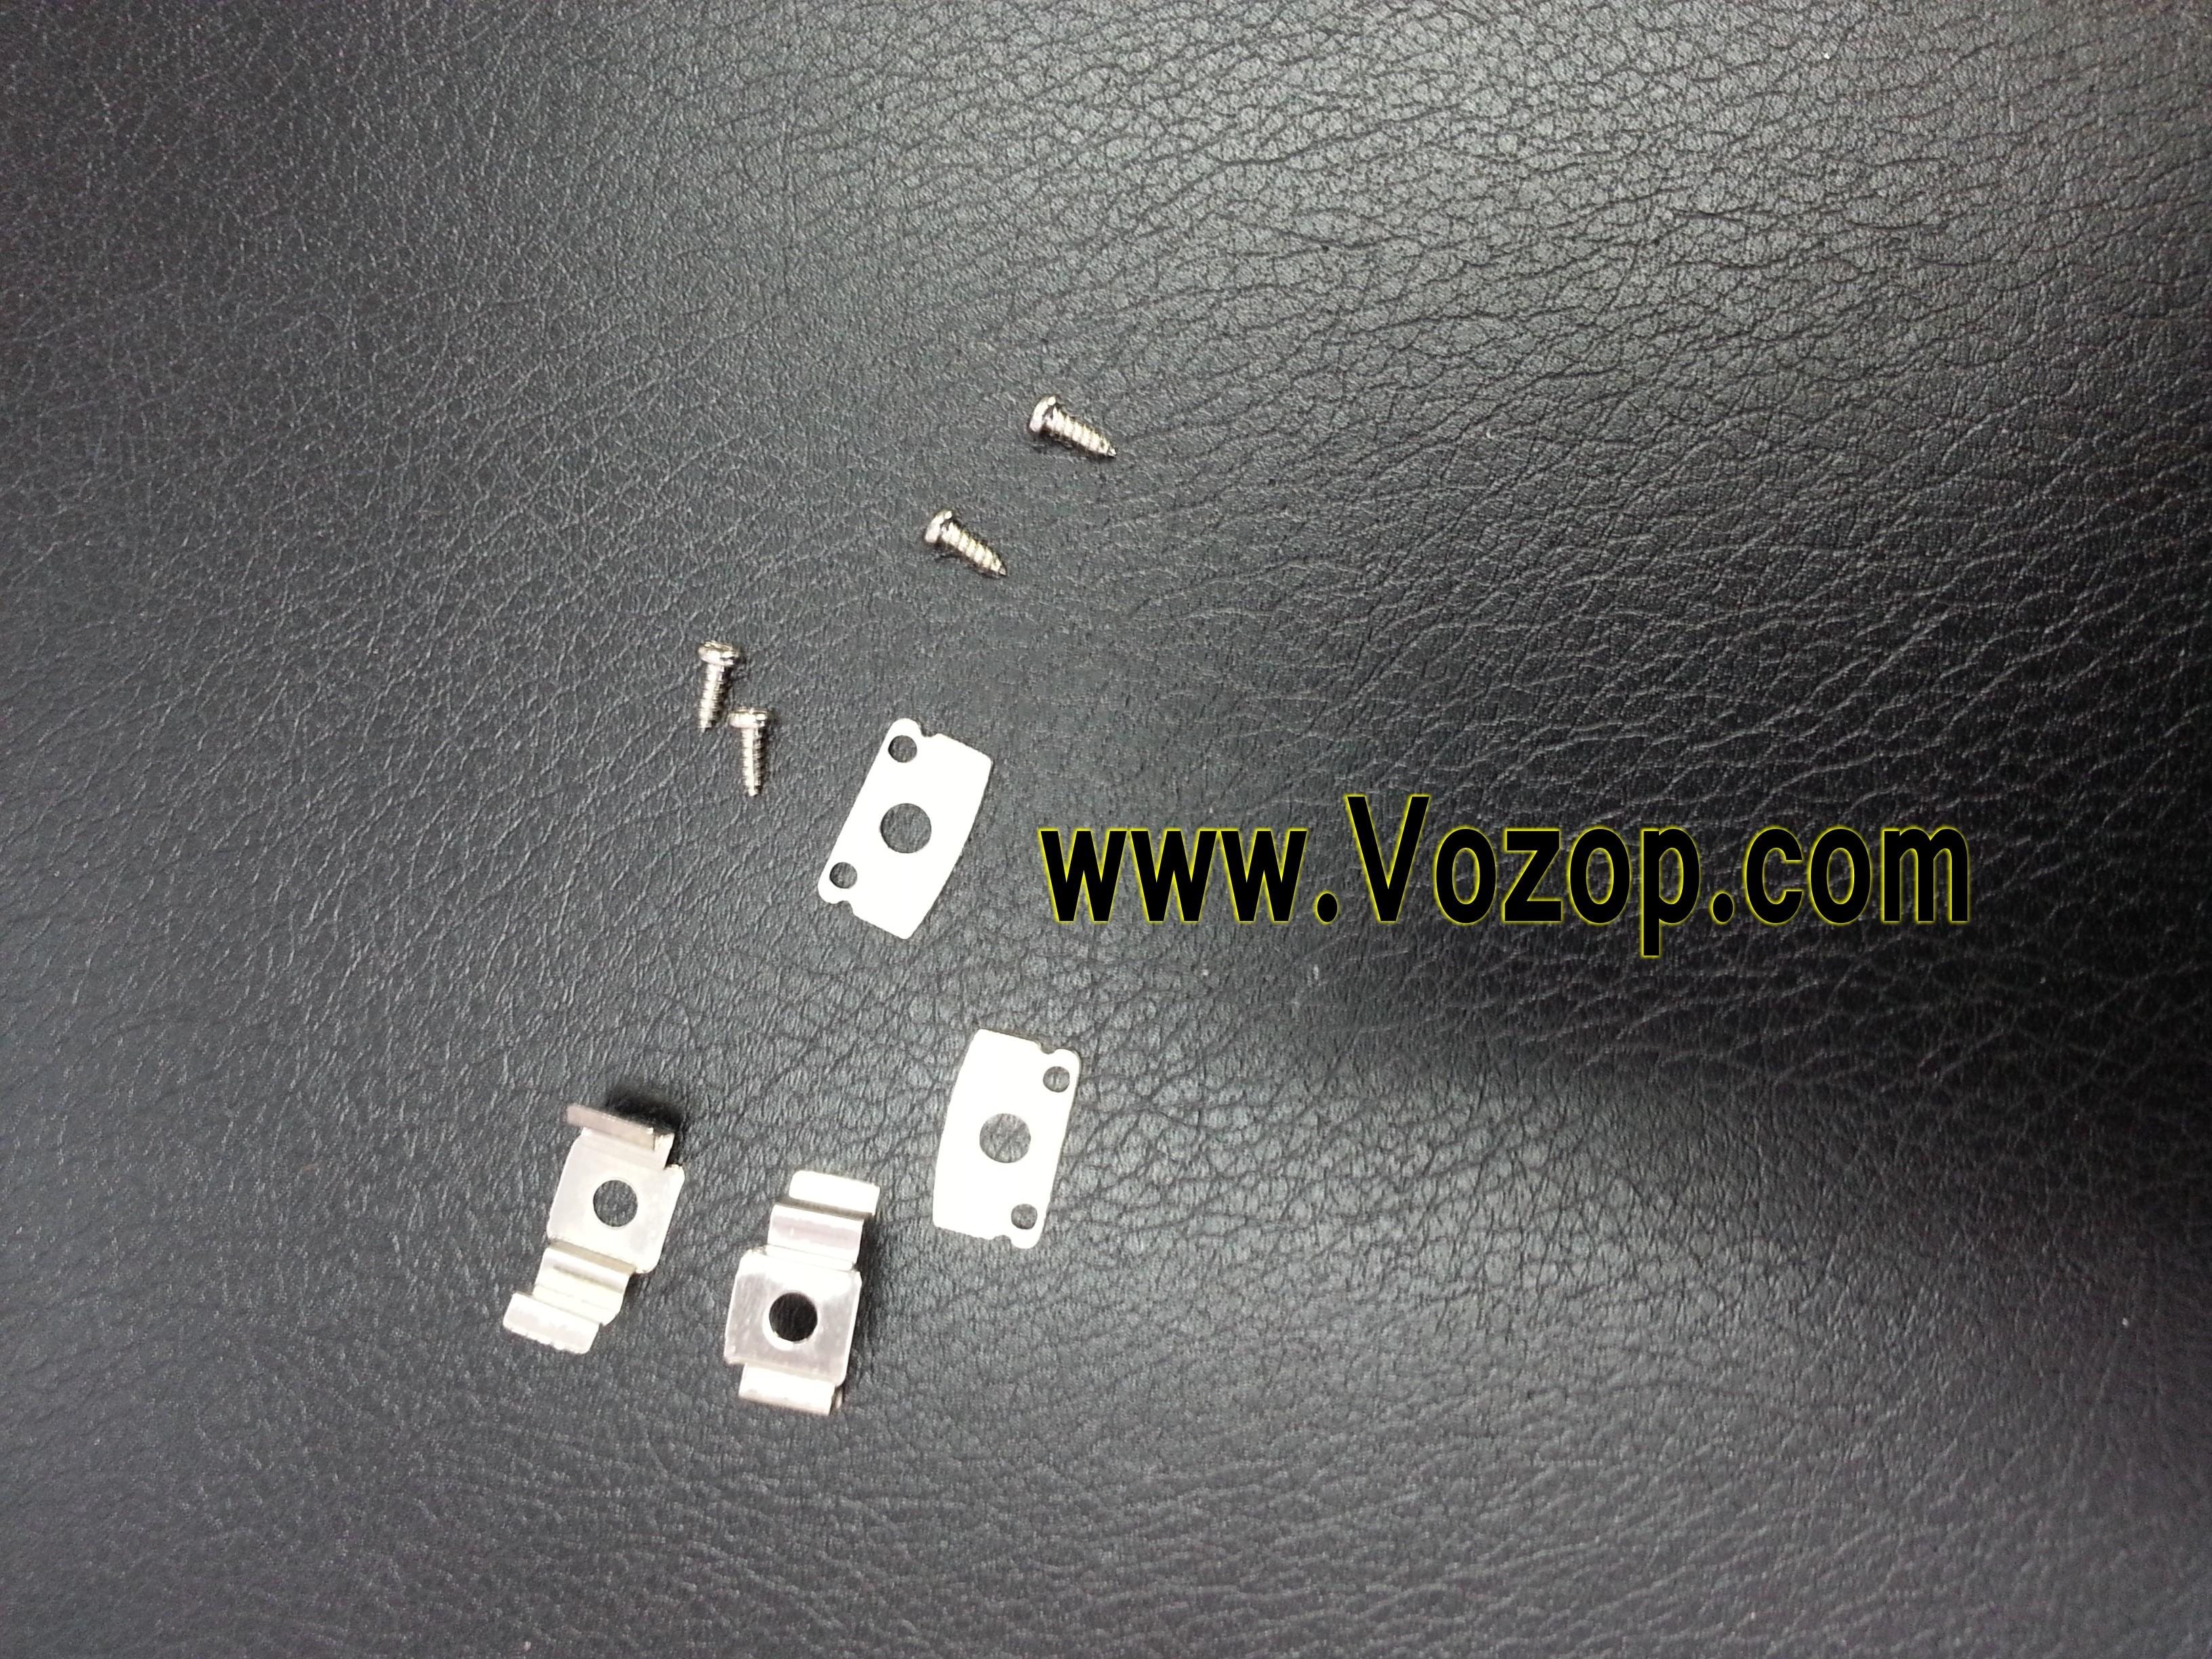 Micro_Aluminum_Channel_for_10mm_LED_Light_Strip_2